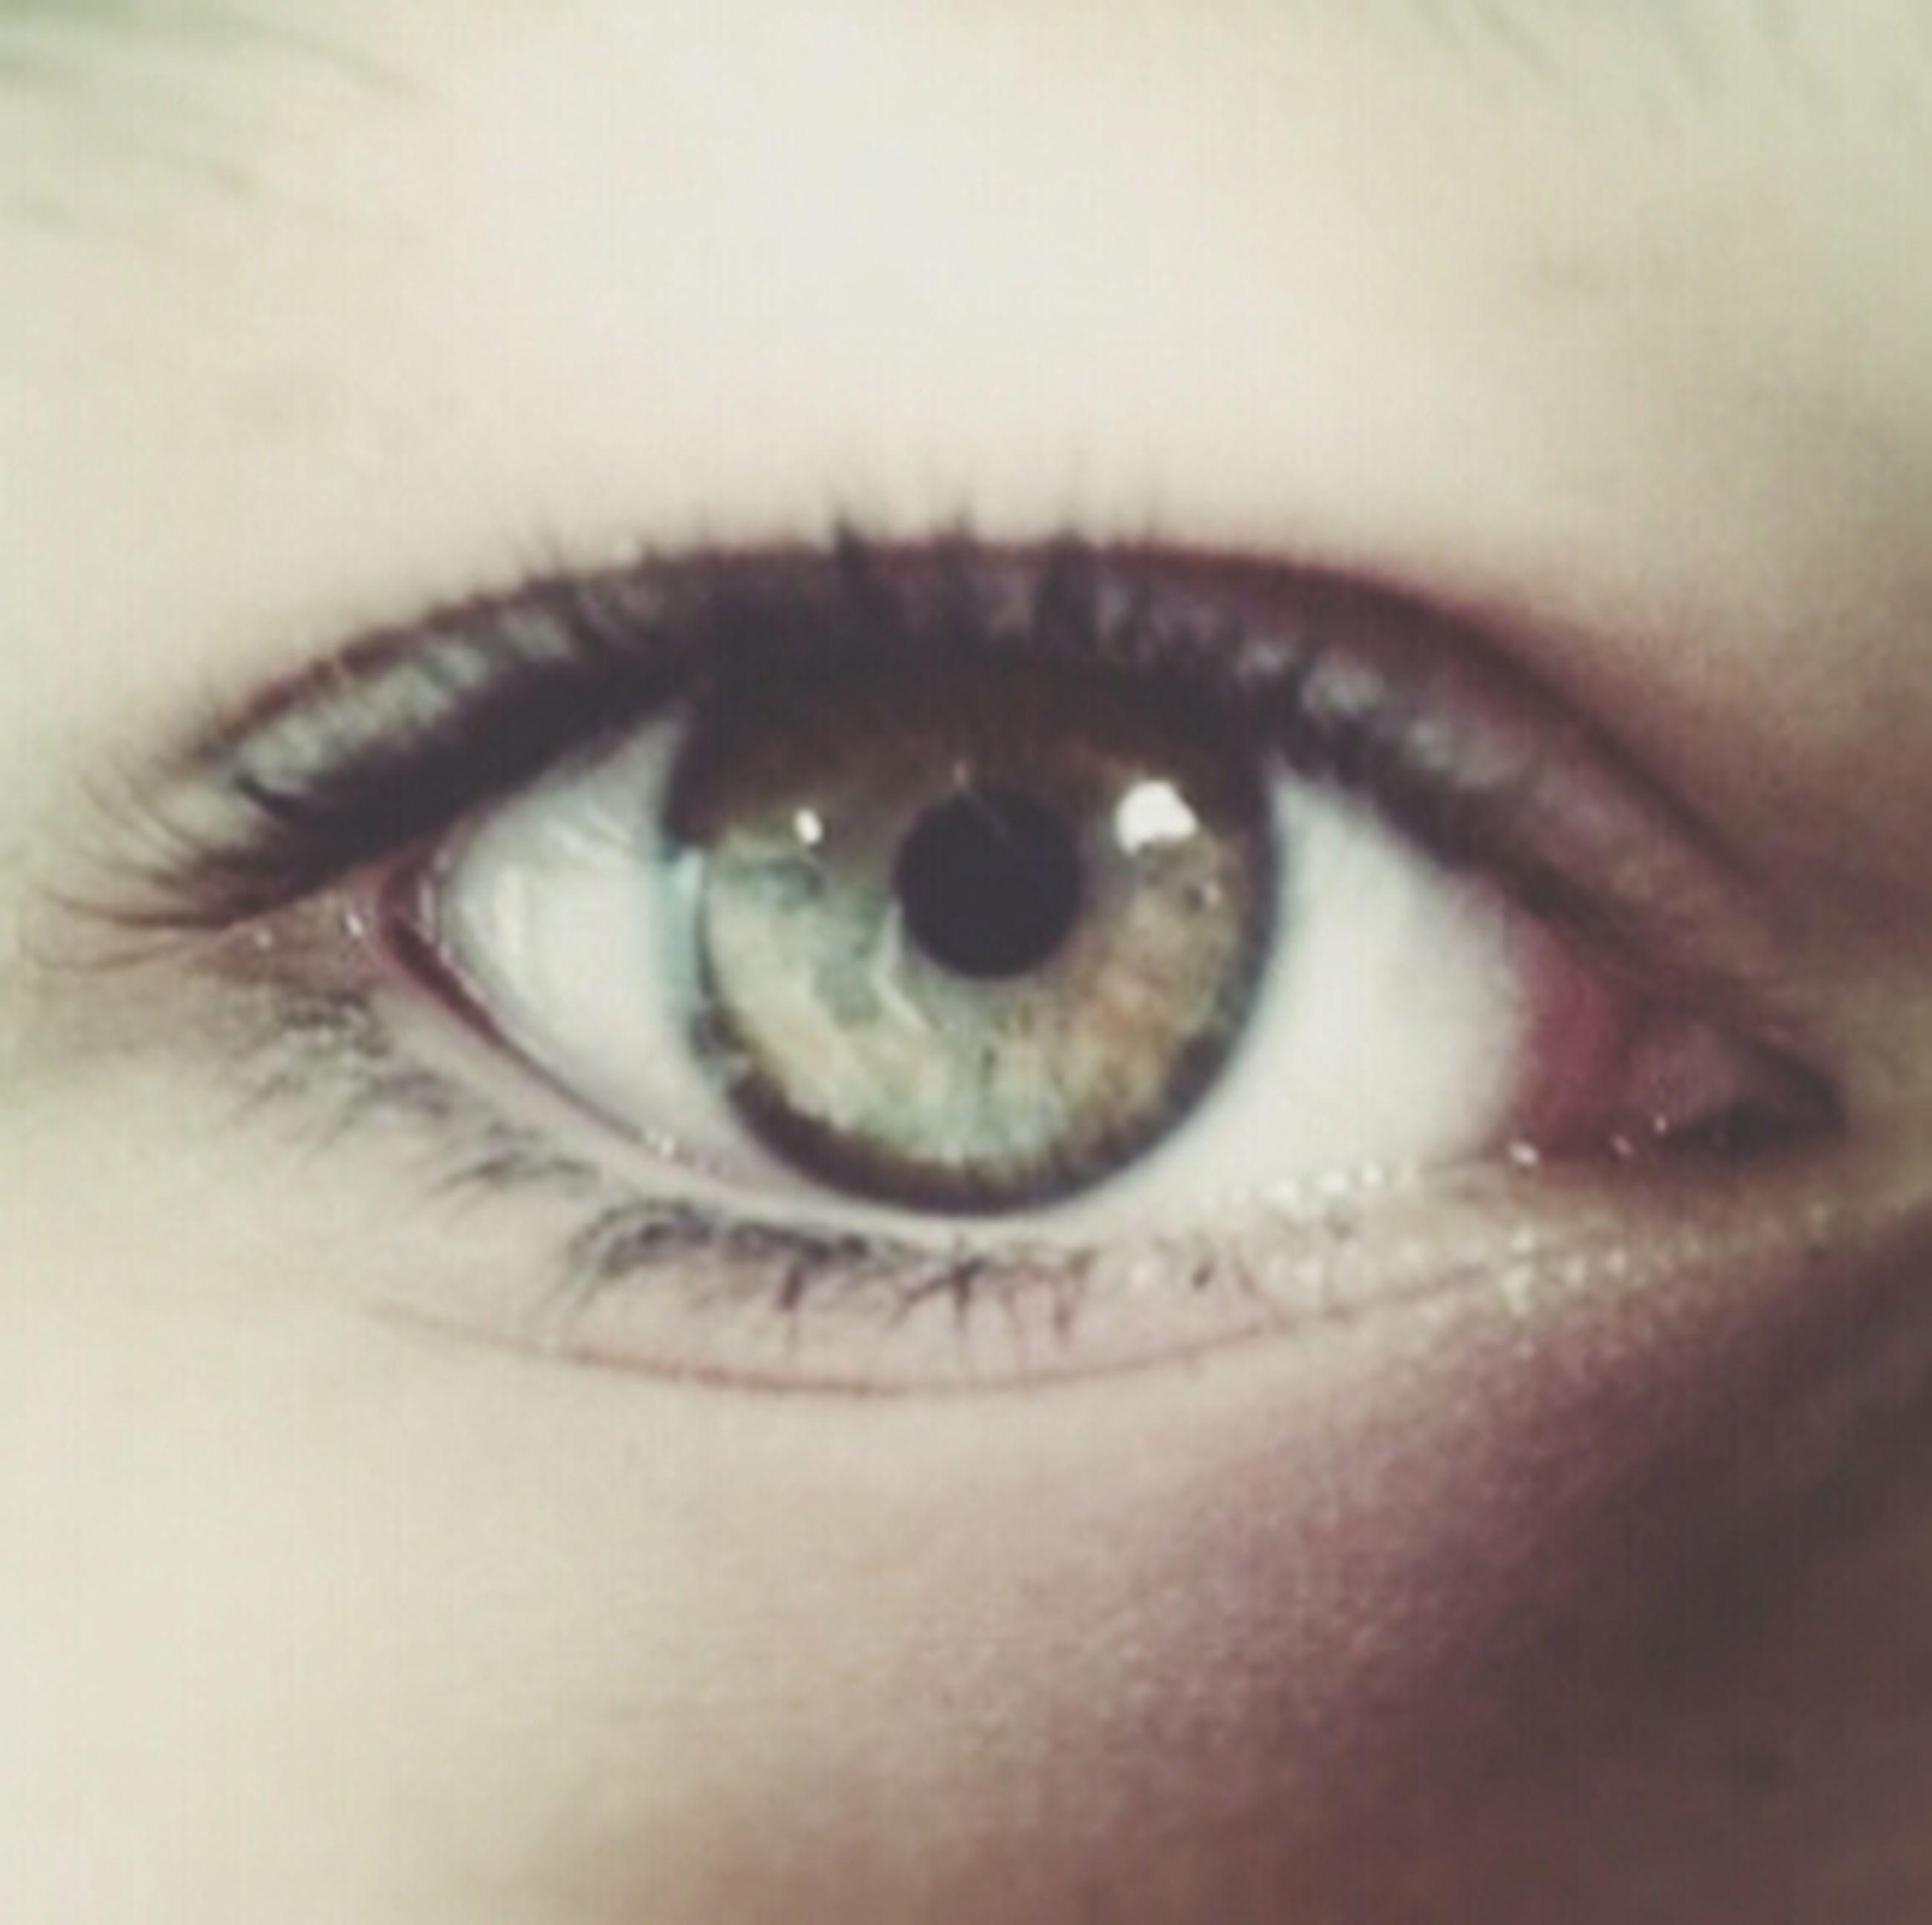 human eye, eyelash, close-up, eyesight, looking at camera, portrait, sensory perception, iris - eye, lifestyles, human face, eyeball, human skin, extreme close-up, part of, eyebrow, indoors, extreme close up